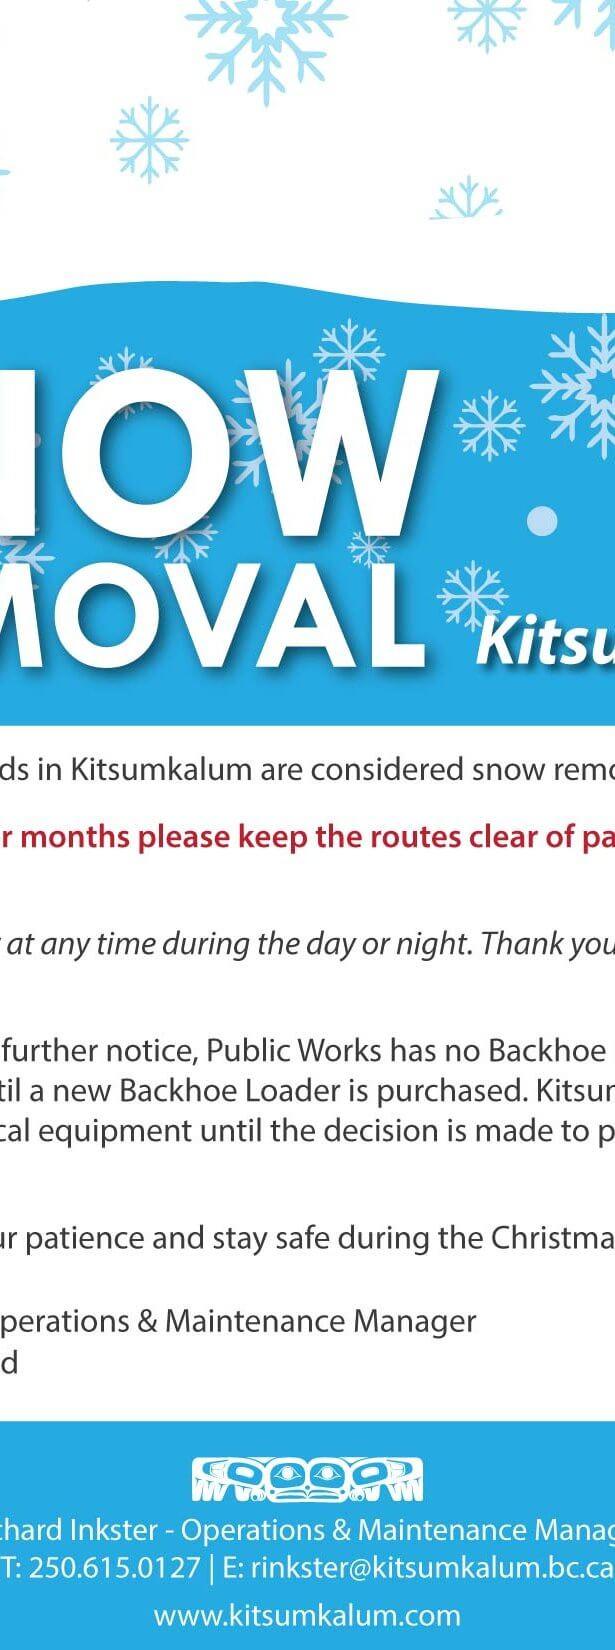 Housing & Property Maintenance | Kitsumkalum, a Galts'ap (community